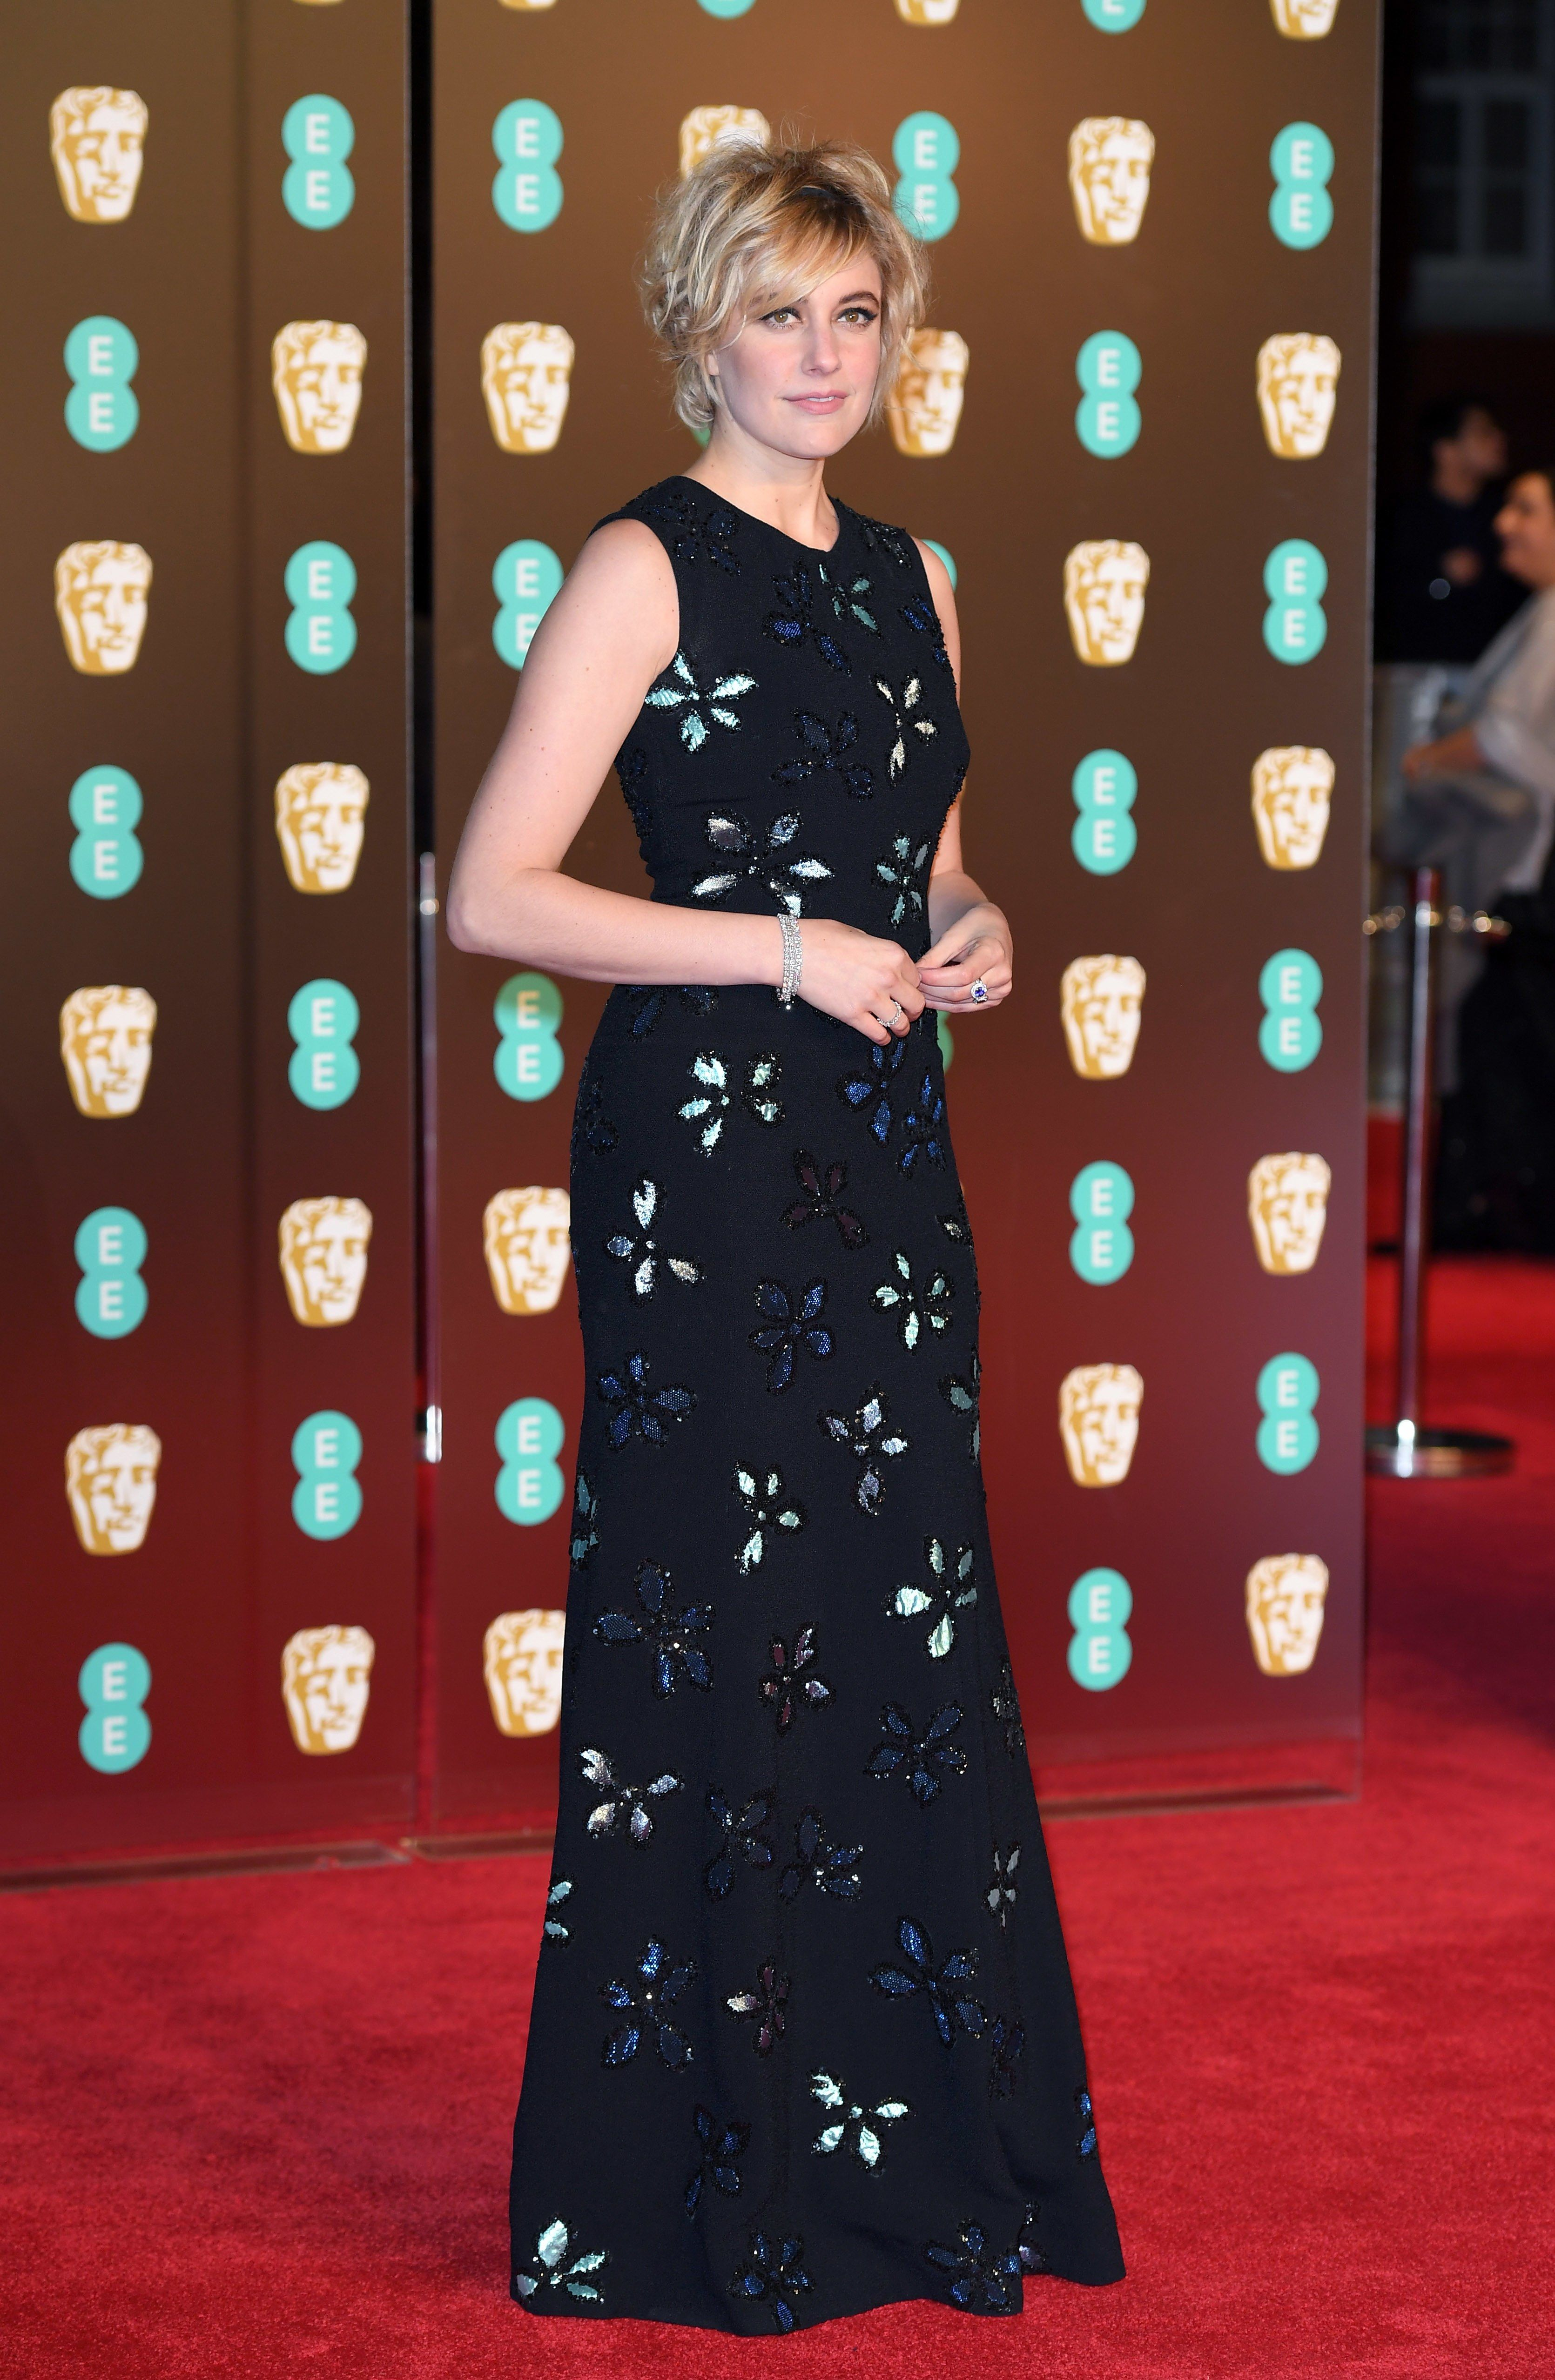 Bafta Red Carpet 2018 See Jennifer Lawrence Angelina Jolie And More Actresses In Black Dresses Bafta Red Carpet